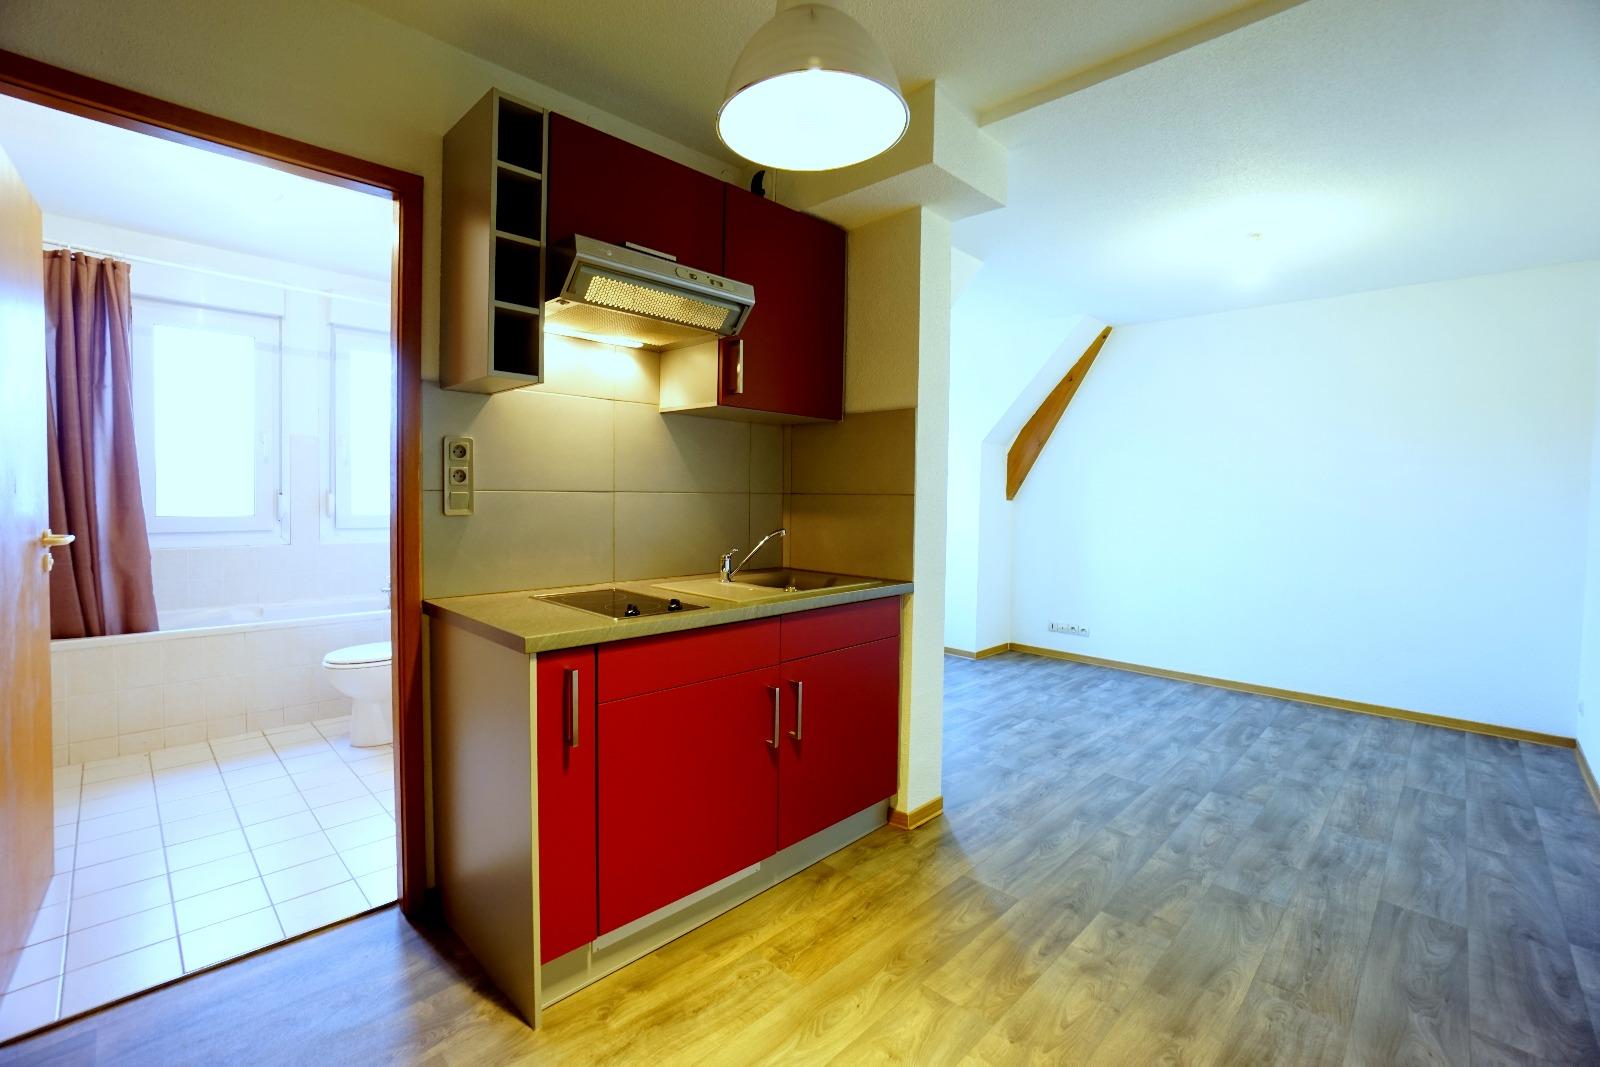 Vente appartement f1 des ann es 1994 for Garage ad la bresse